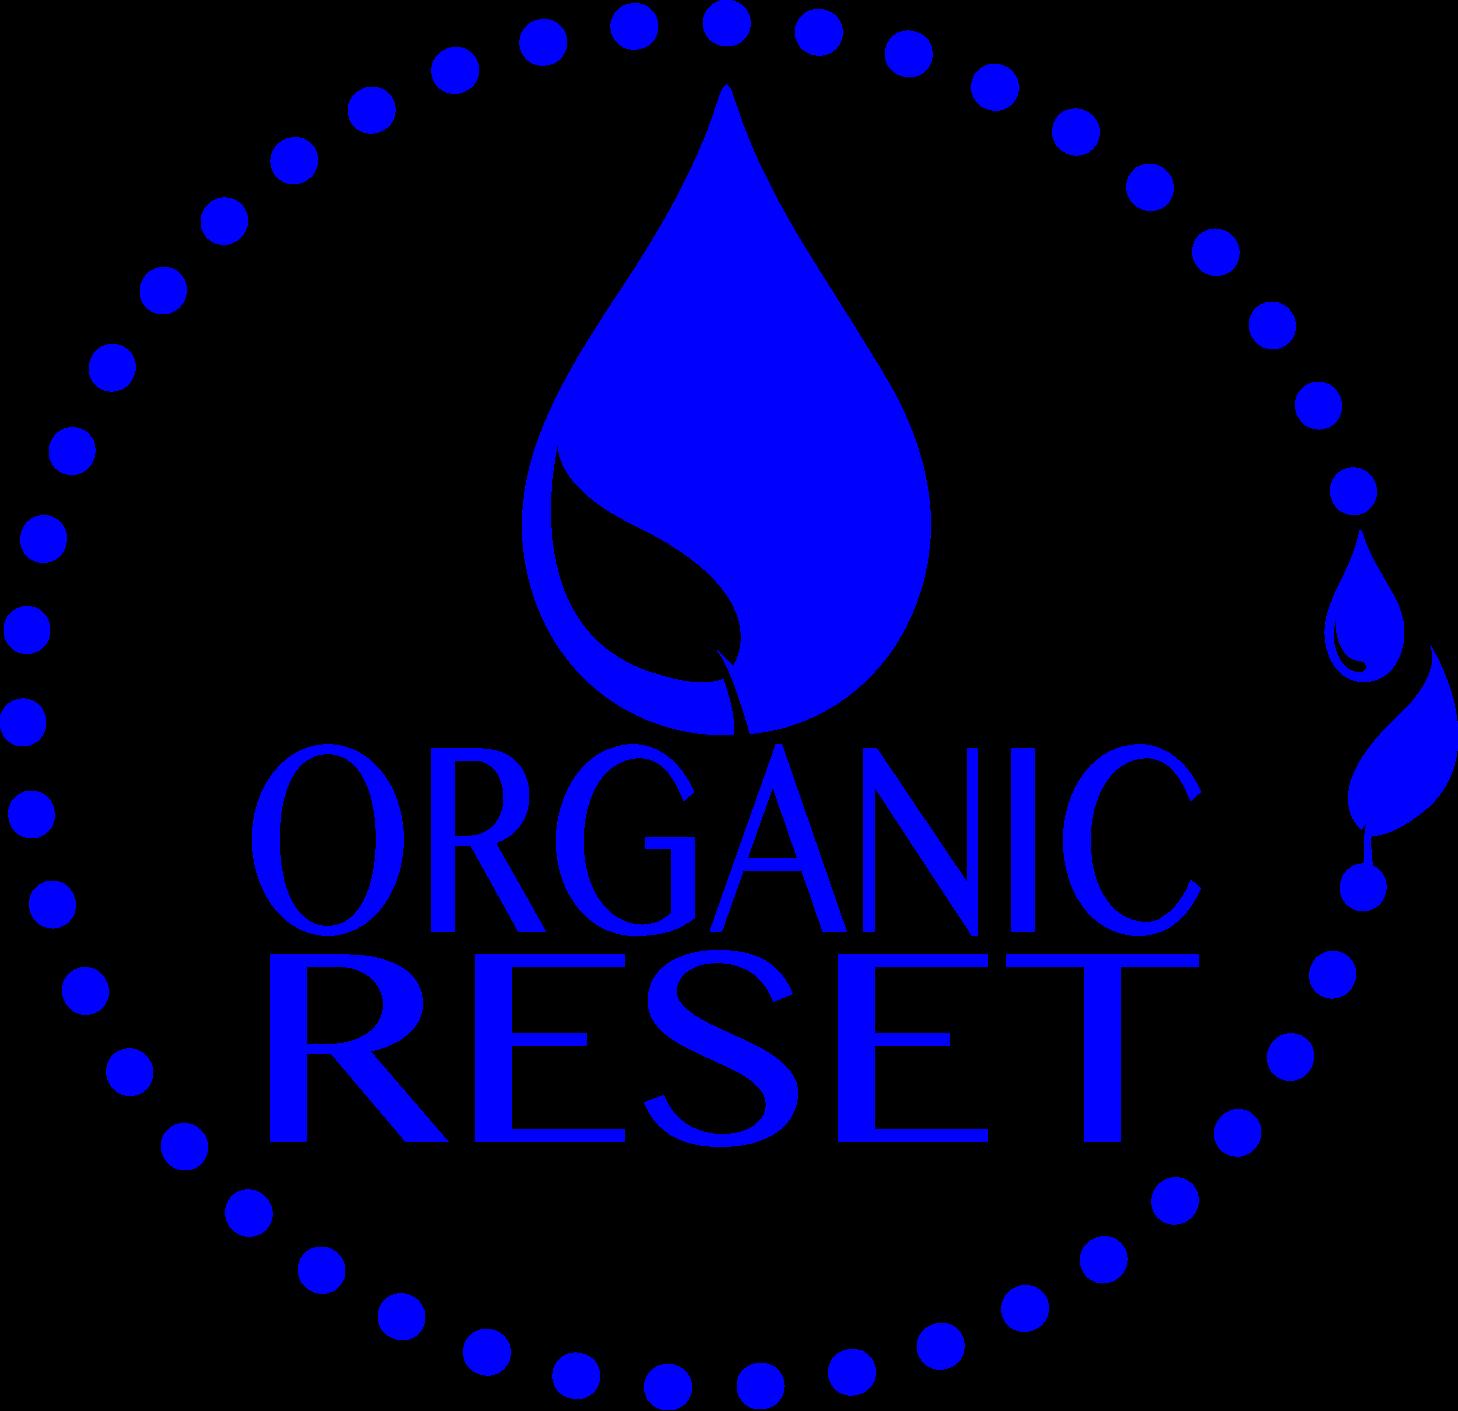 Organic Reset